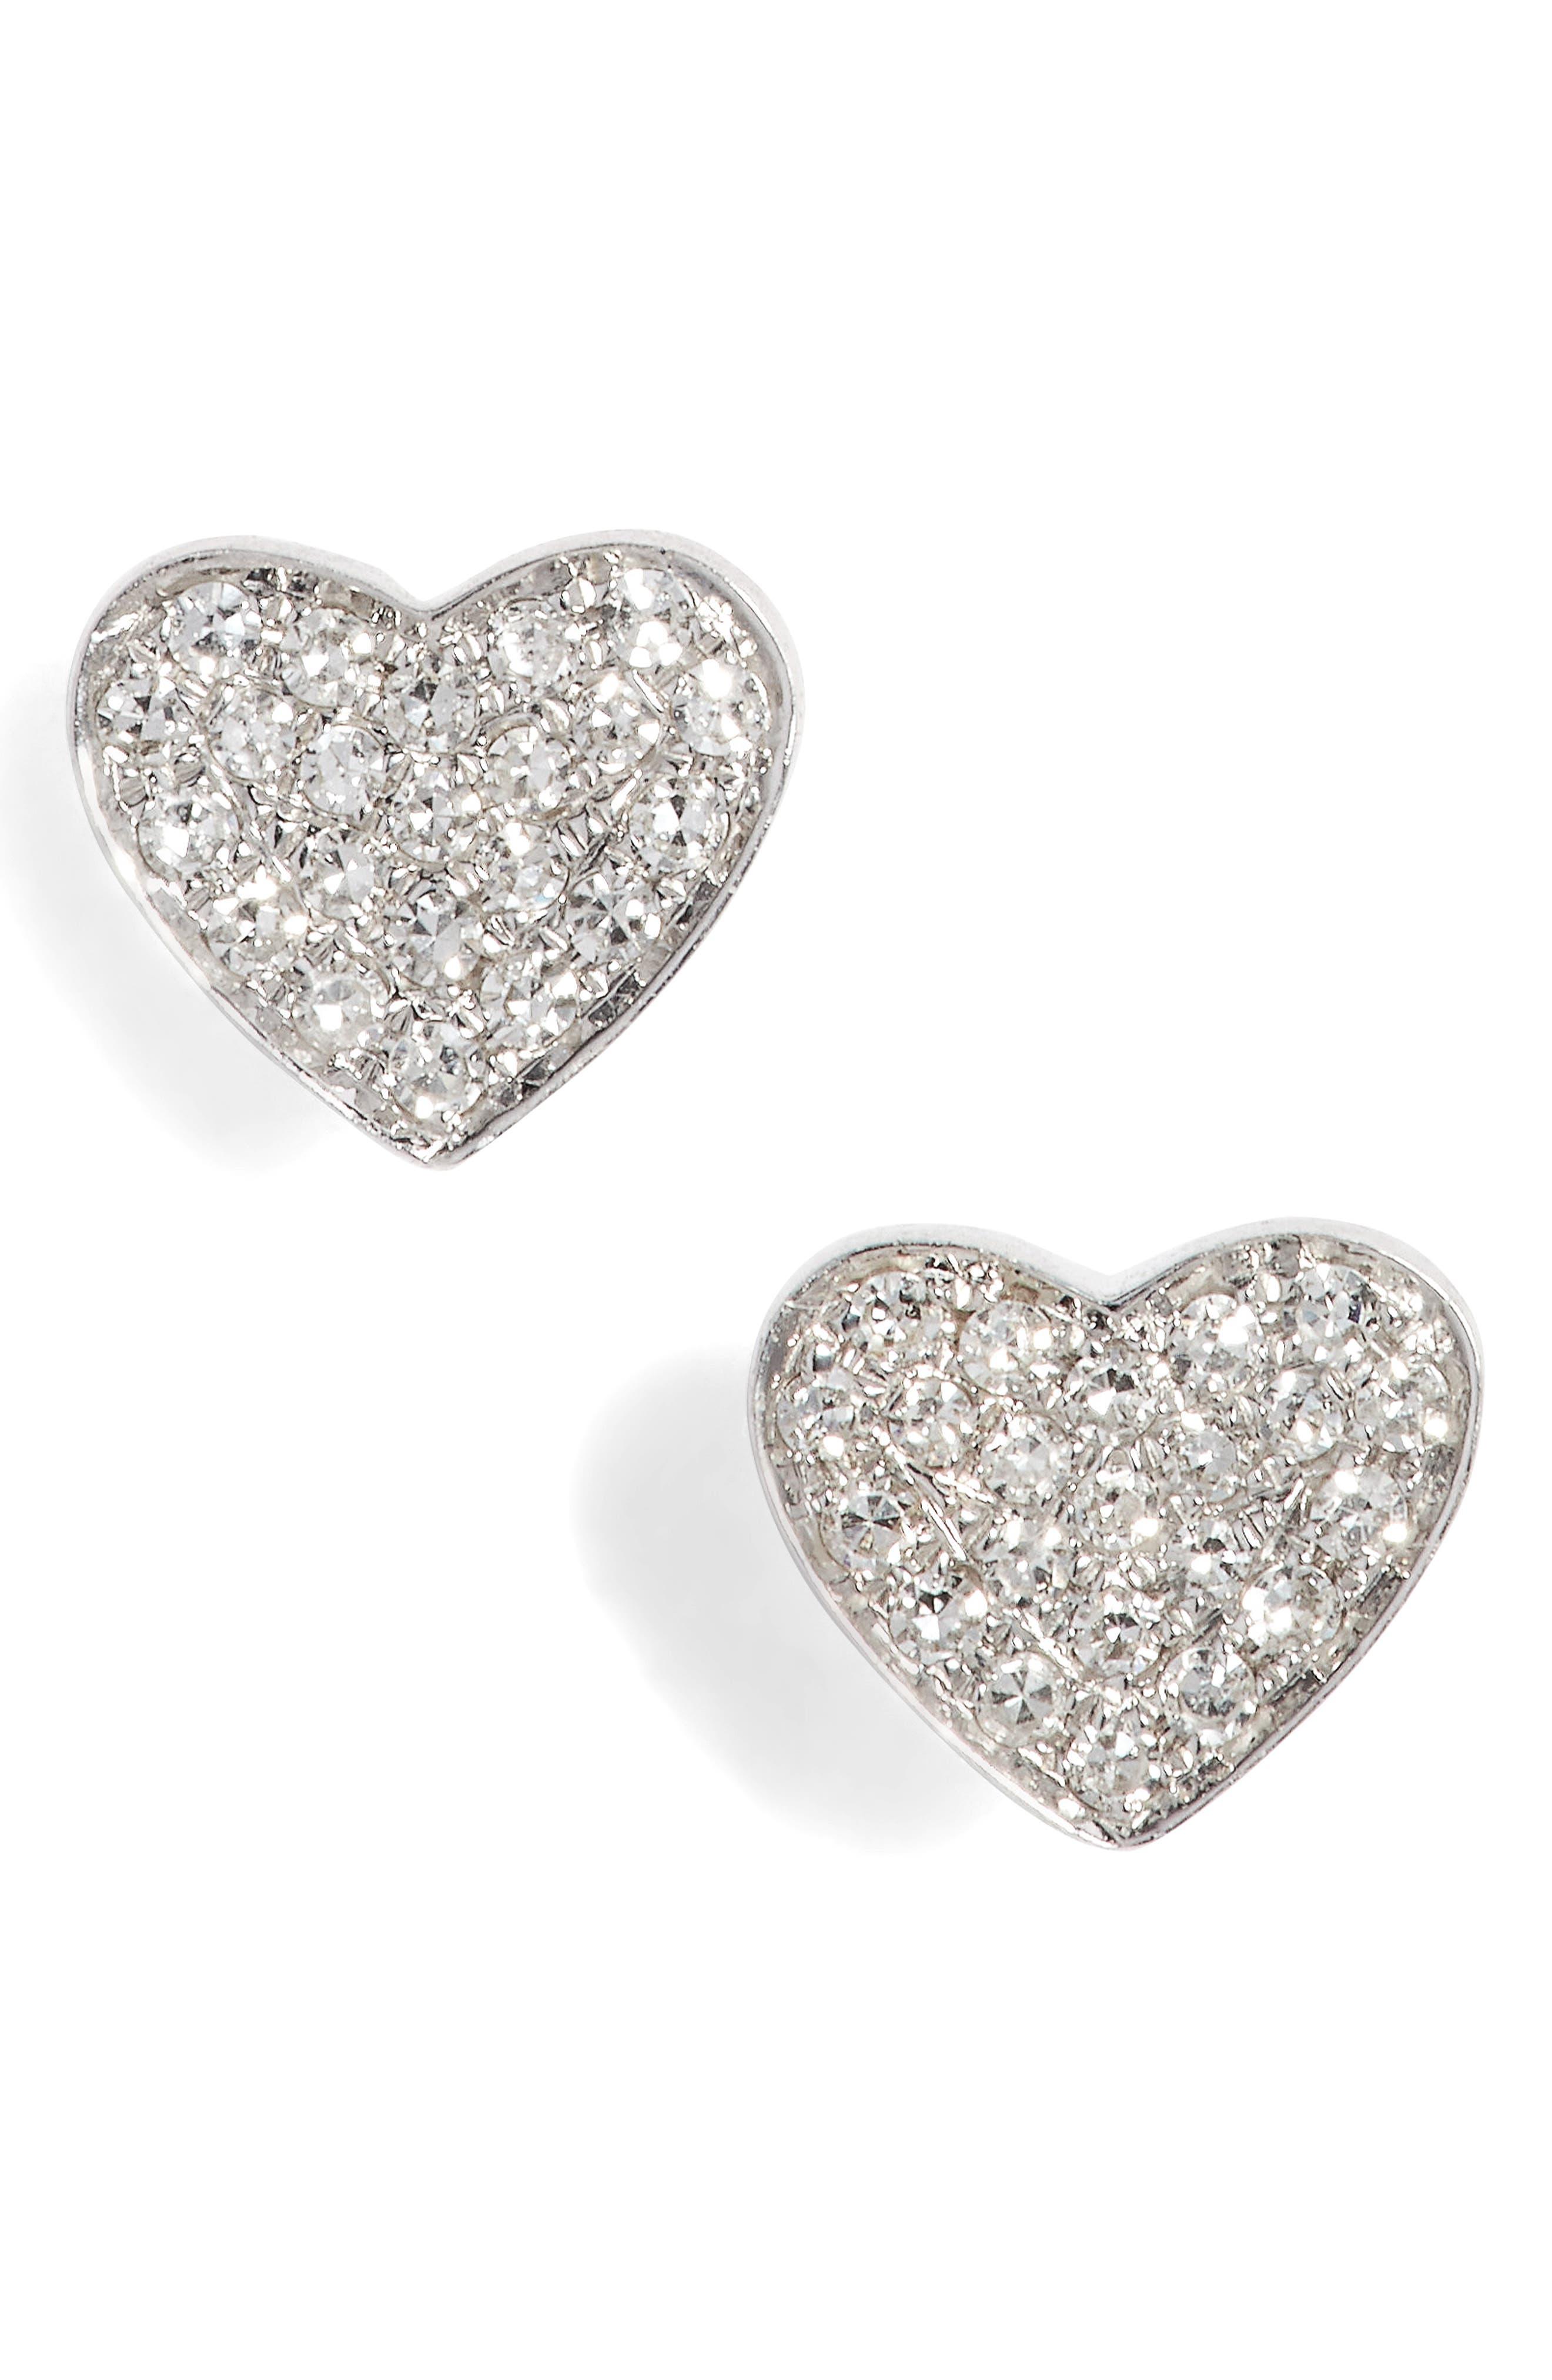 Main Image - EF COLLECTION Diamond Heart Stud Earrings